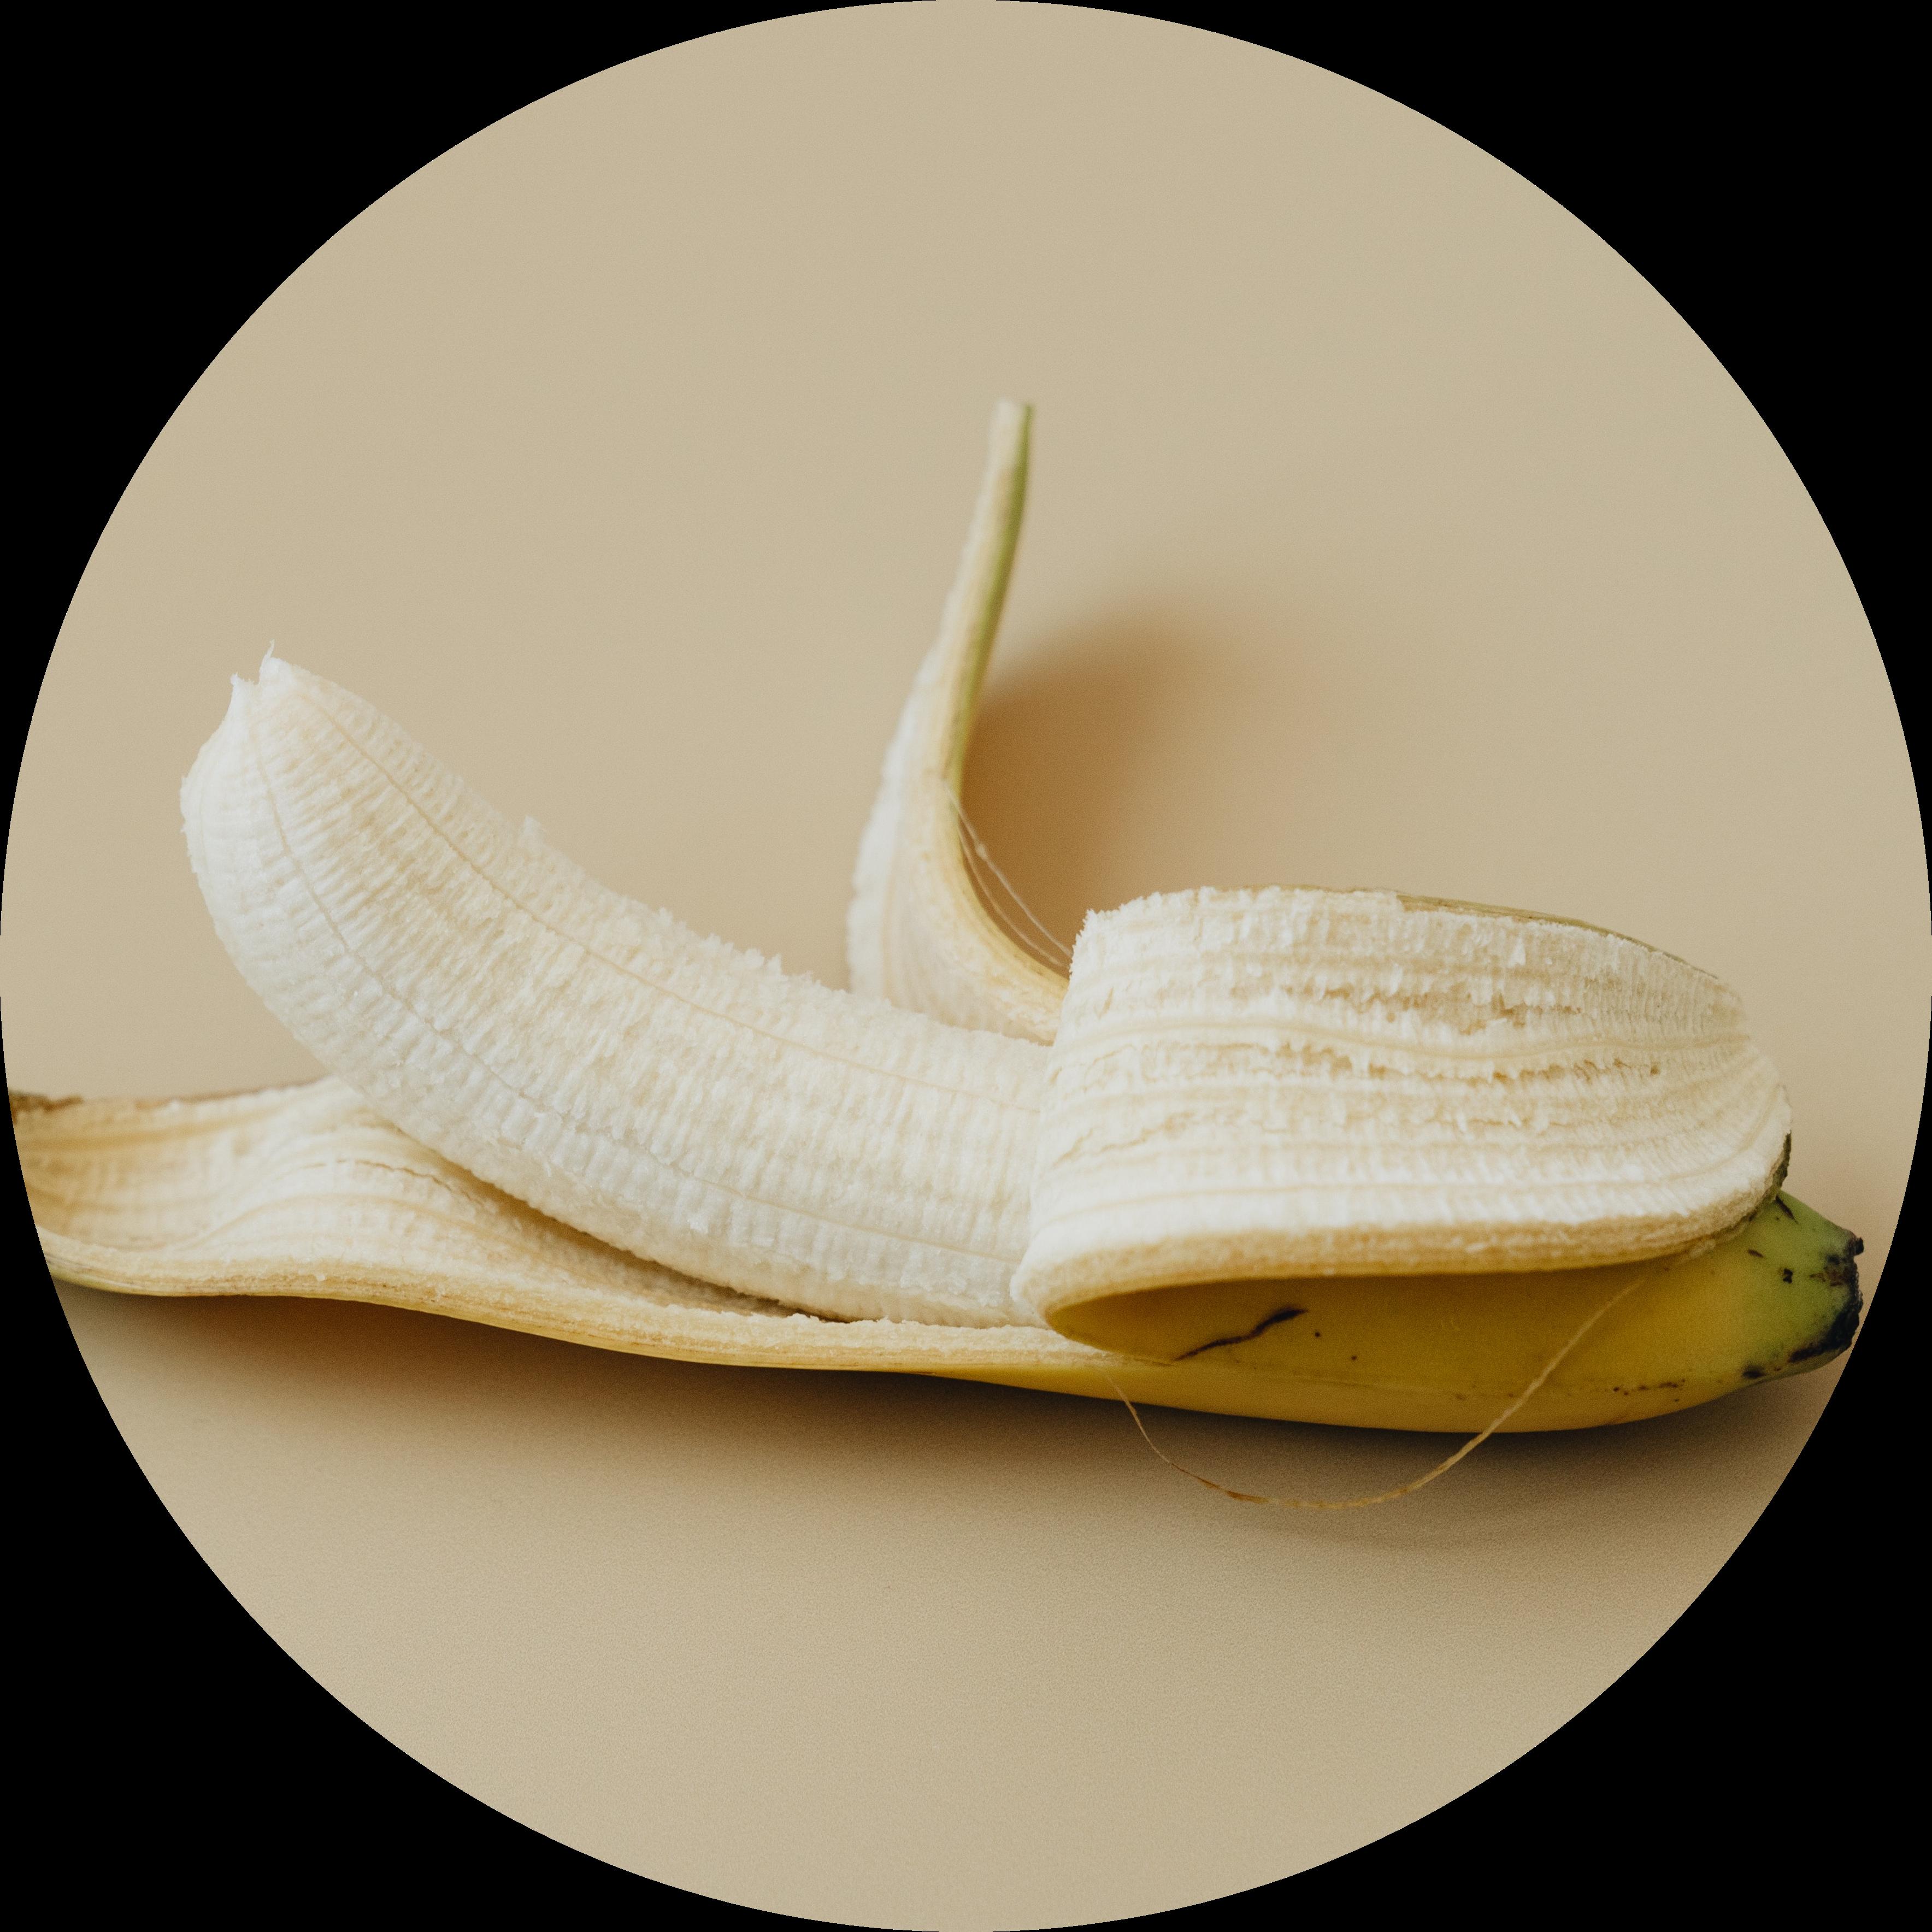 Circumcised vs. Uncircumcised: Effects On Erectile Dysfunction